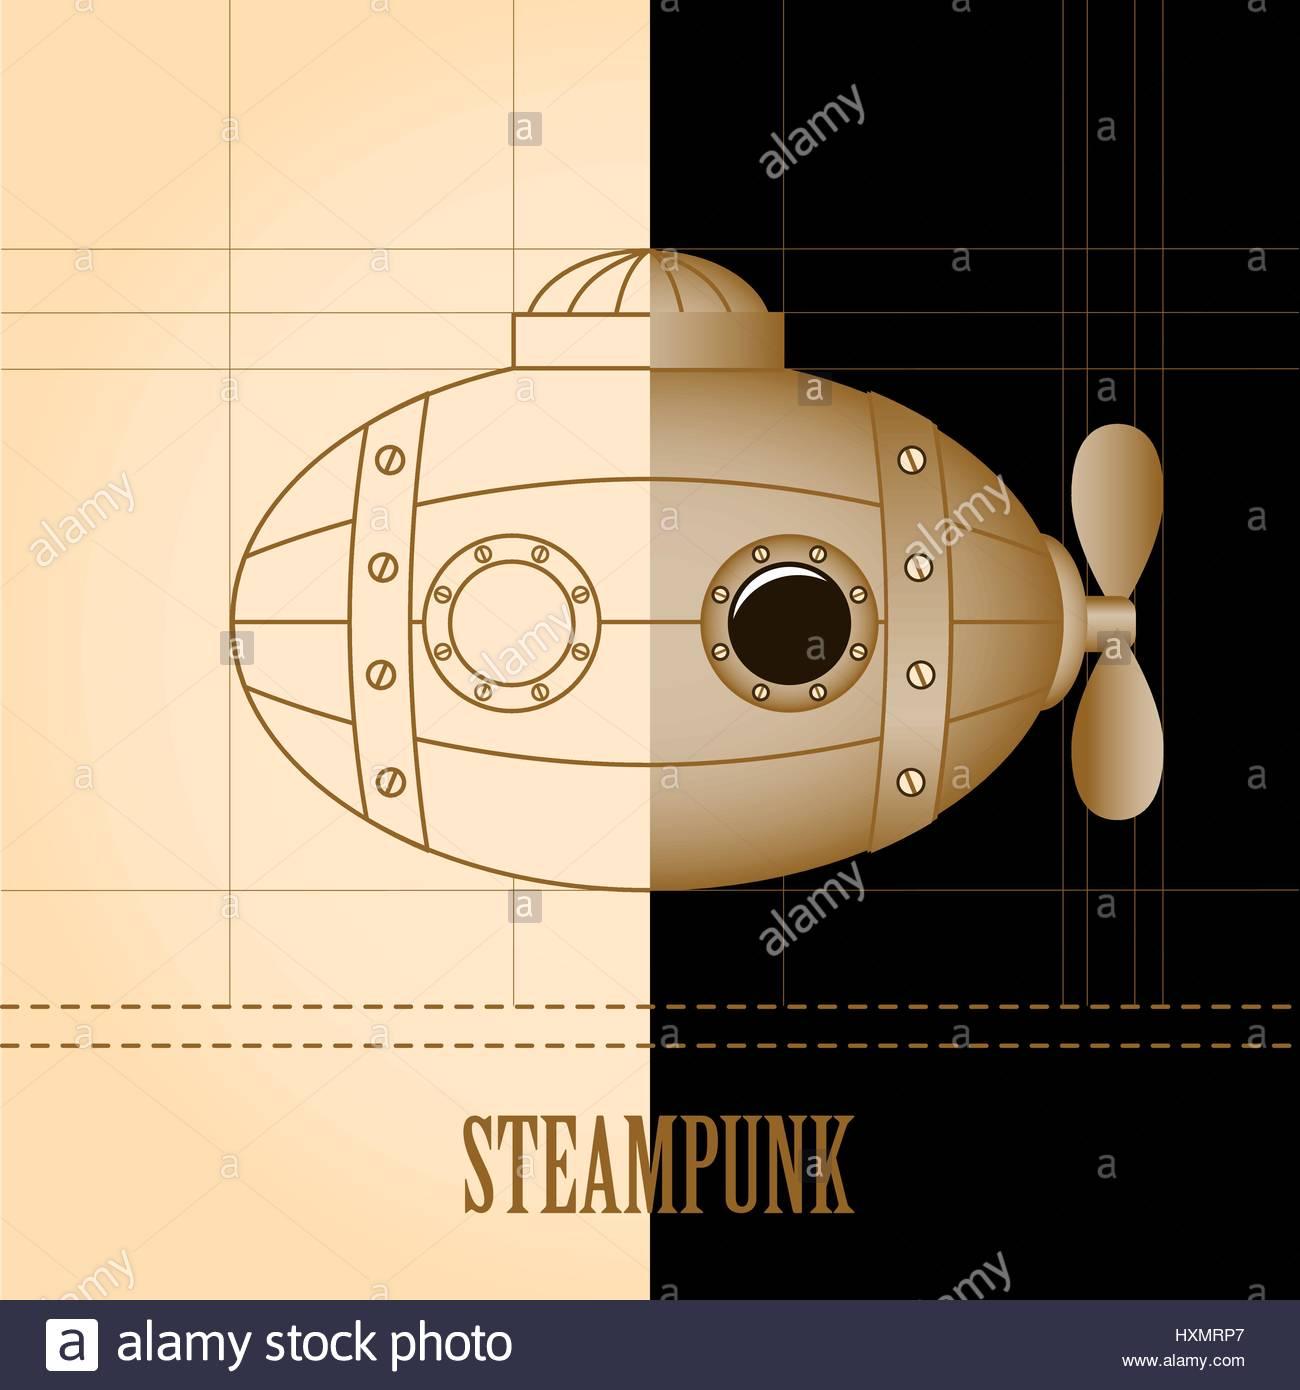 steampunk vector background submarine vintage template design for